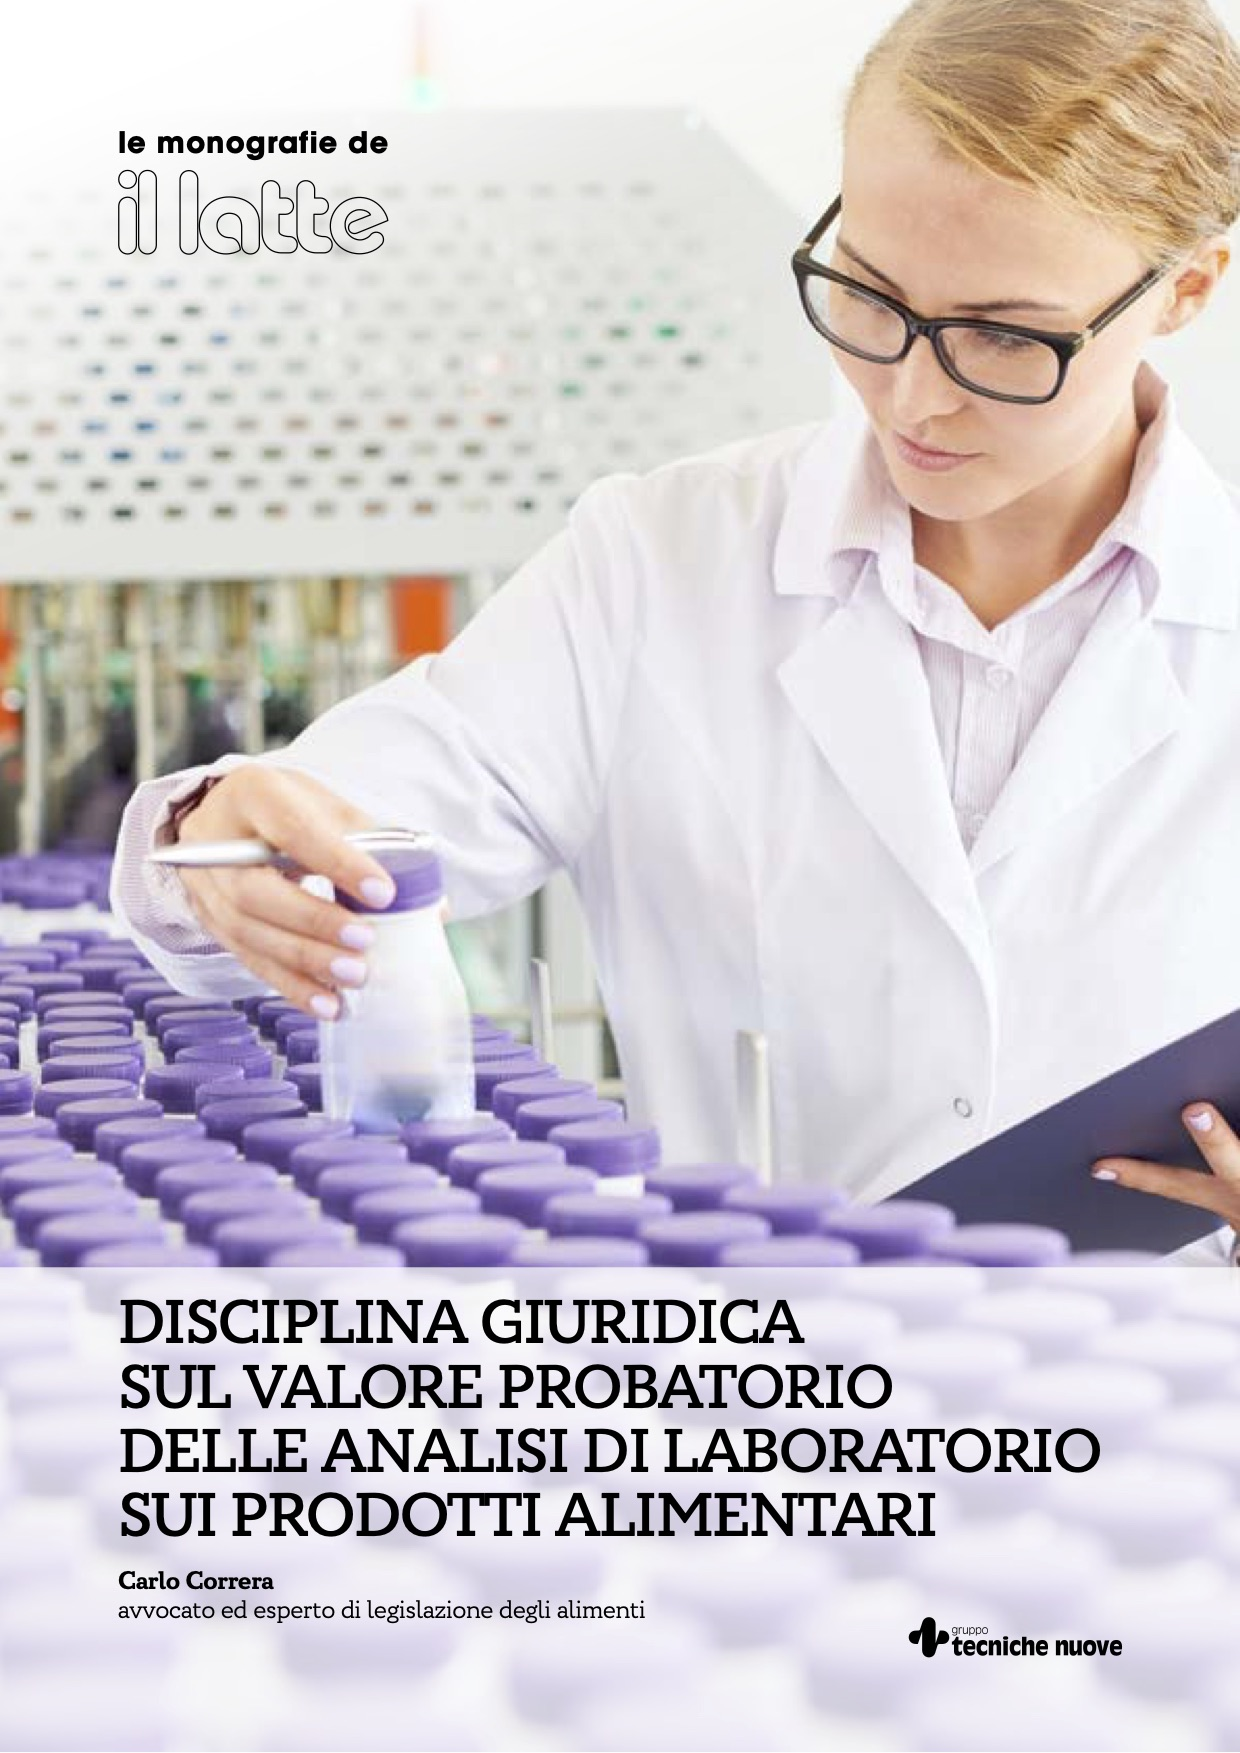 LT - COPERTINA WP_disciplina giuridica sul valore probatorio